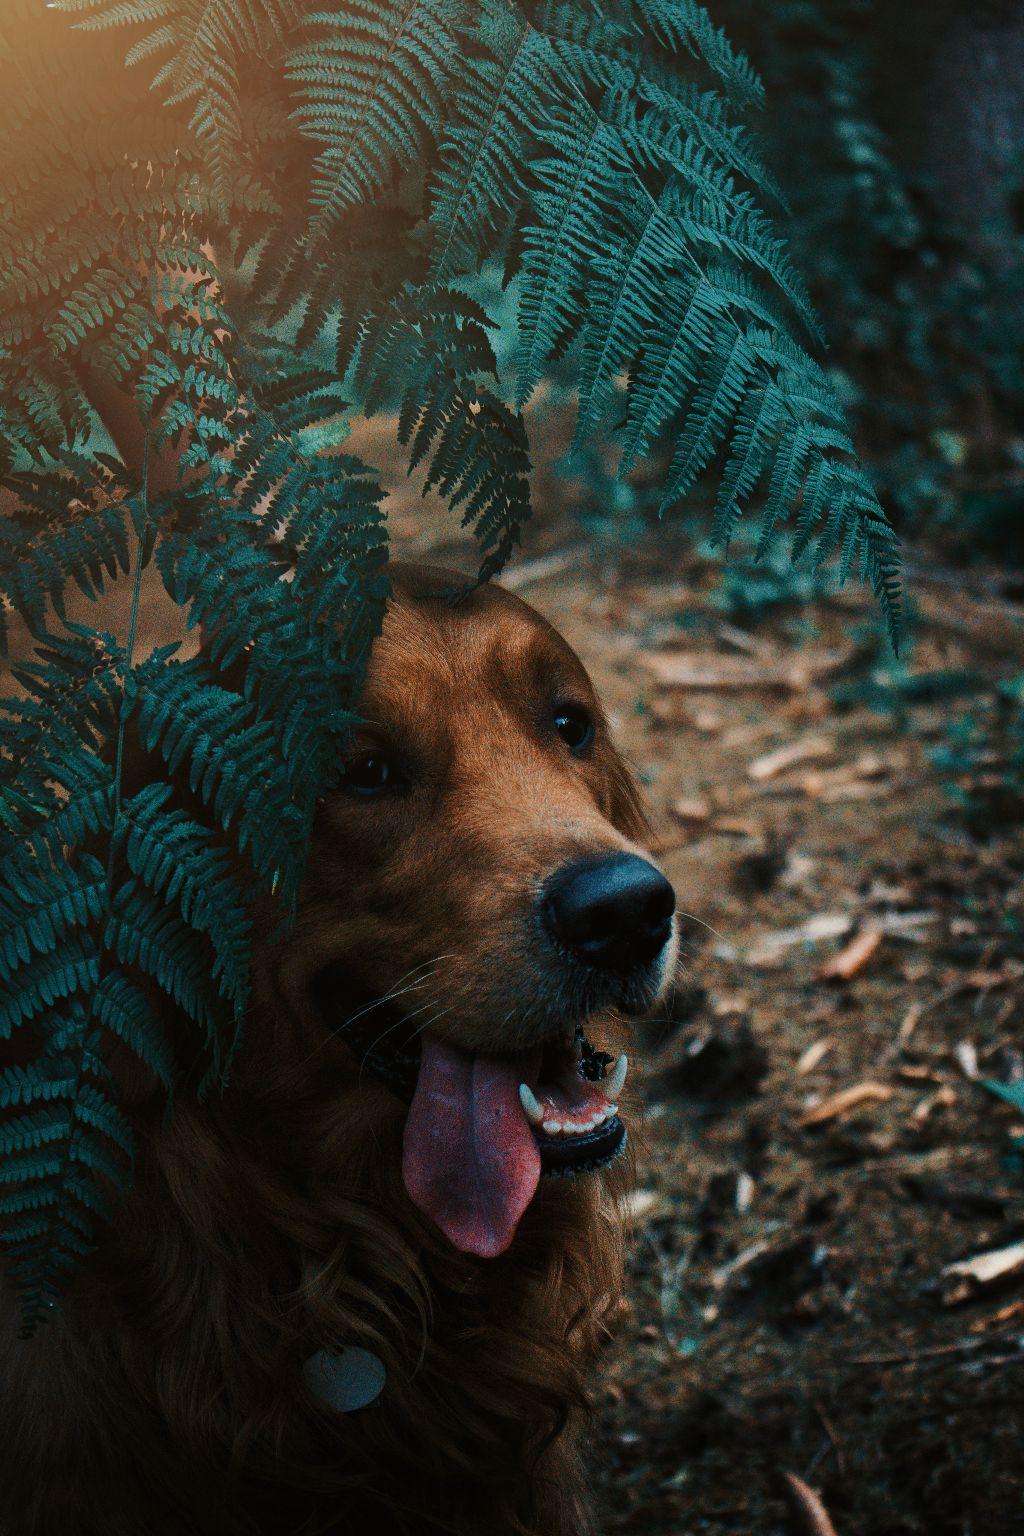 #freetoedit #editit #dog #pet #photography #petphotography #shotiniphone #canon #forest #maylo #fun